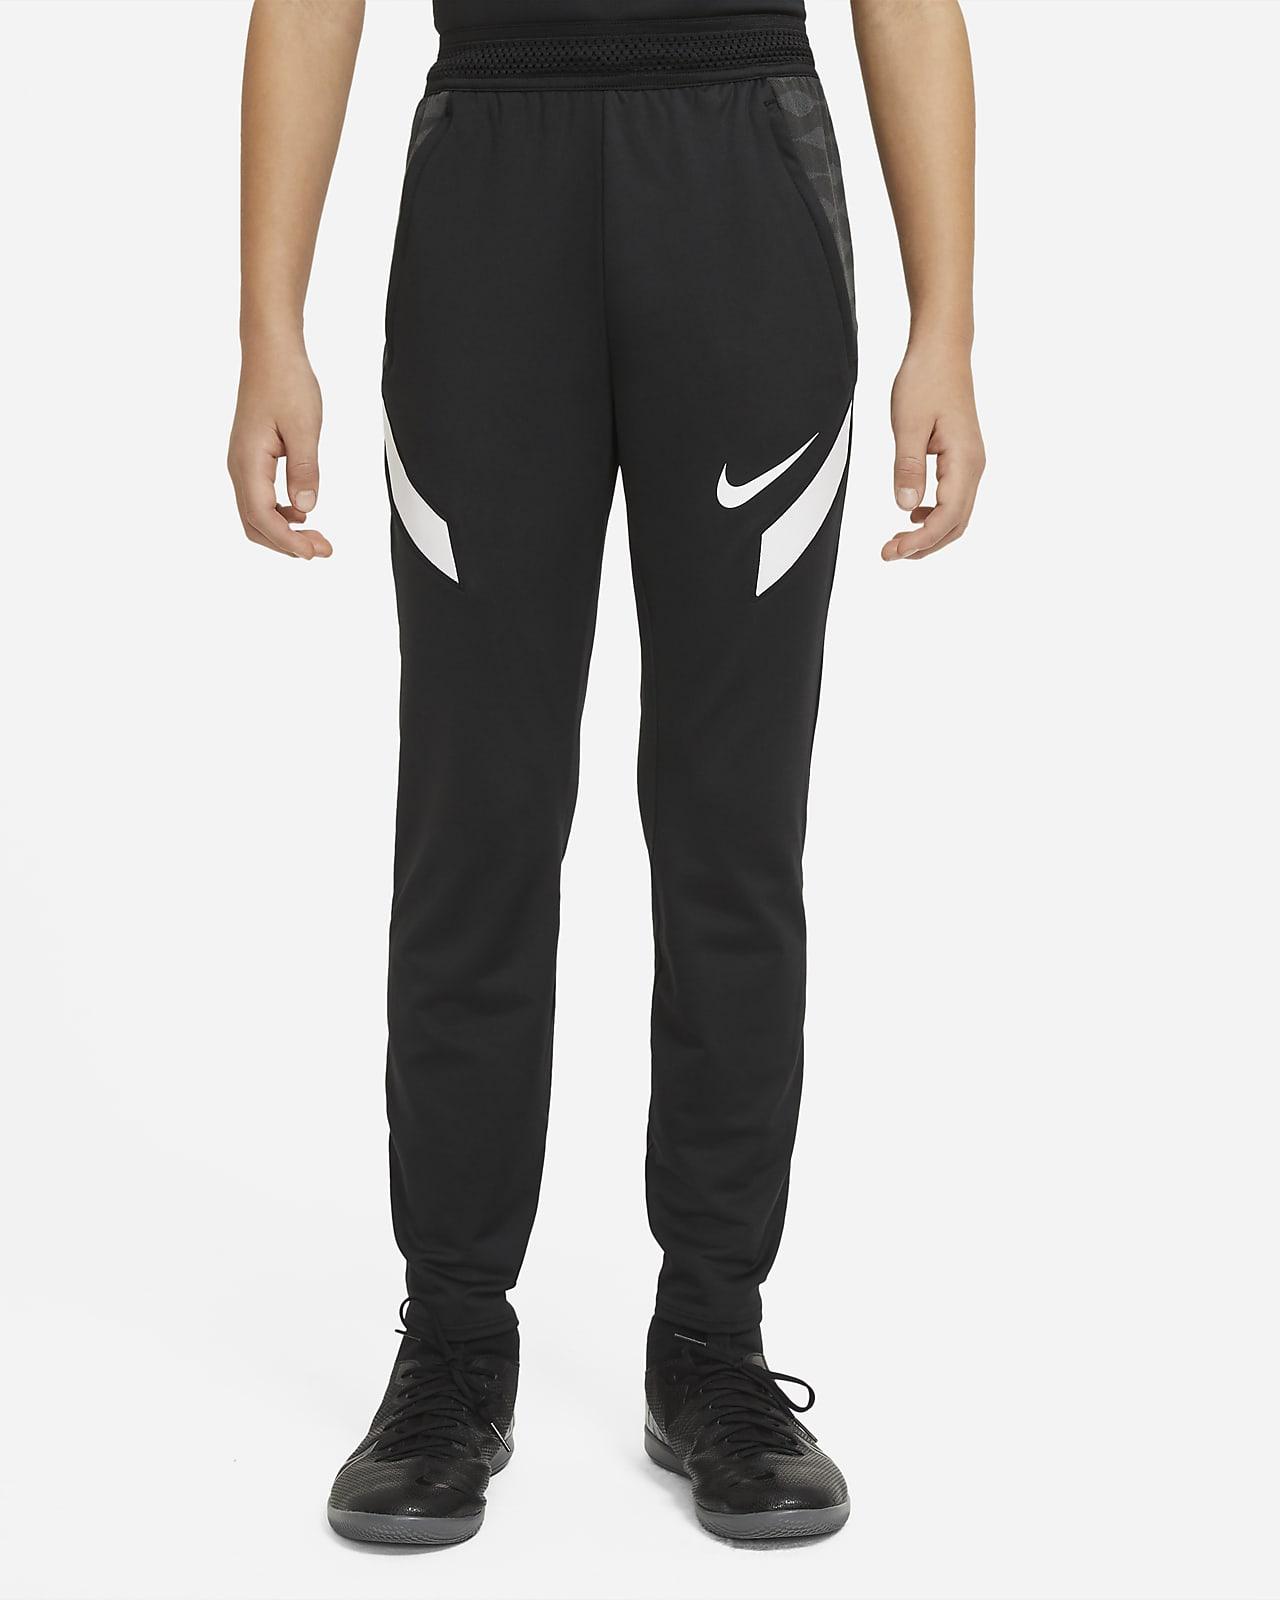 Pantalones tejidos de fútbol para niños talla grande Nike Dri-FIT Strike